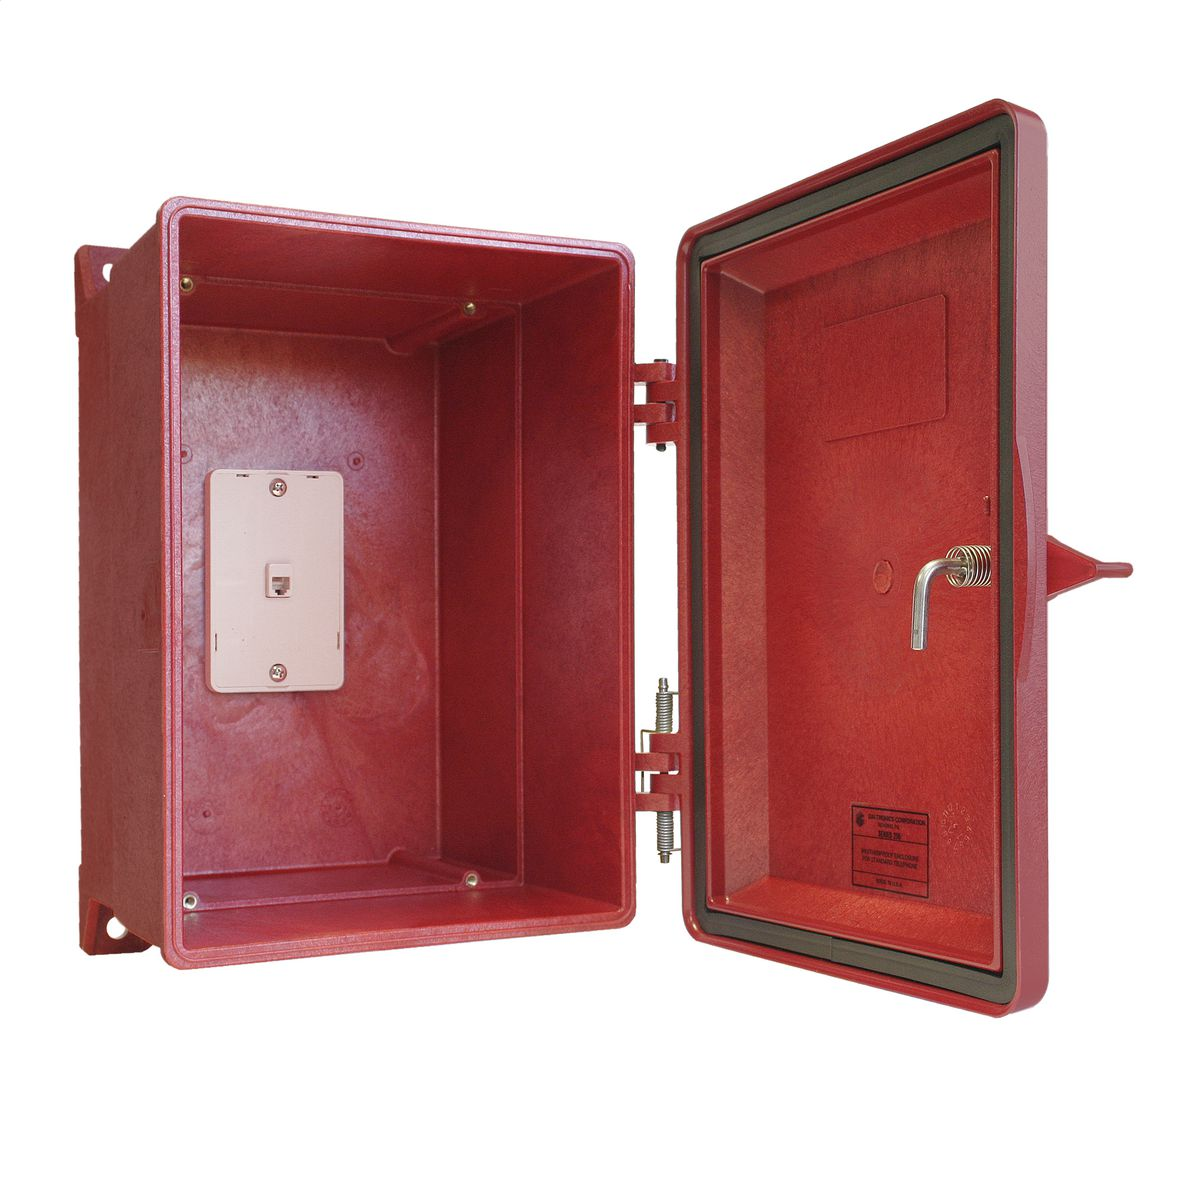 255-003RDSK  sc 1 st  Hubbell & Weatherproof Telephone Enclosure | Brand | GAI-Tronics